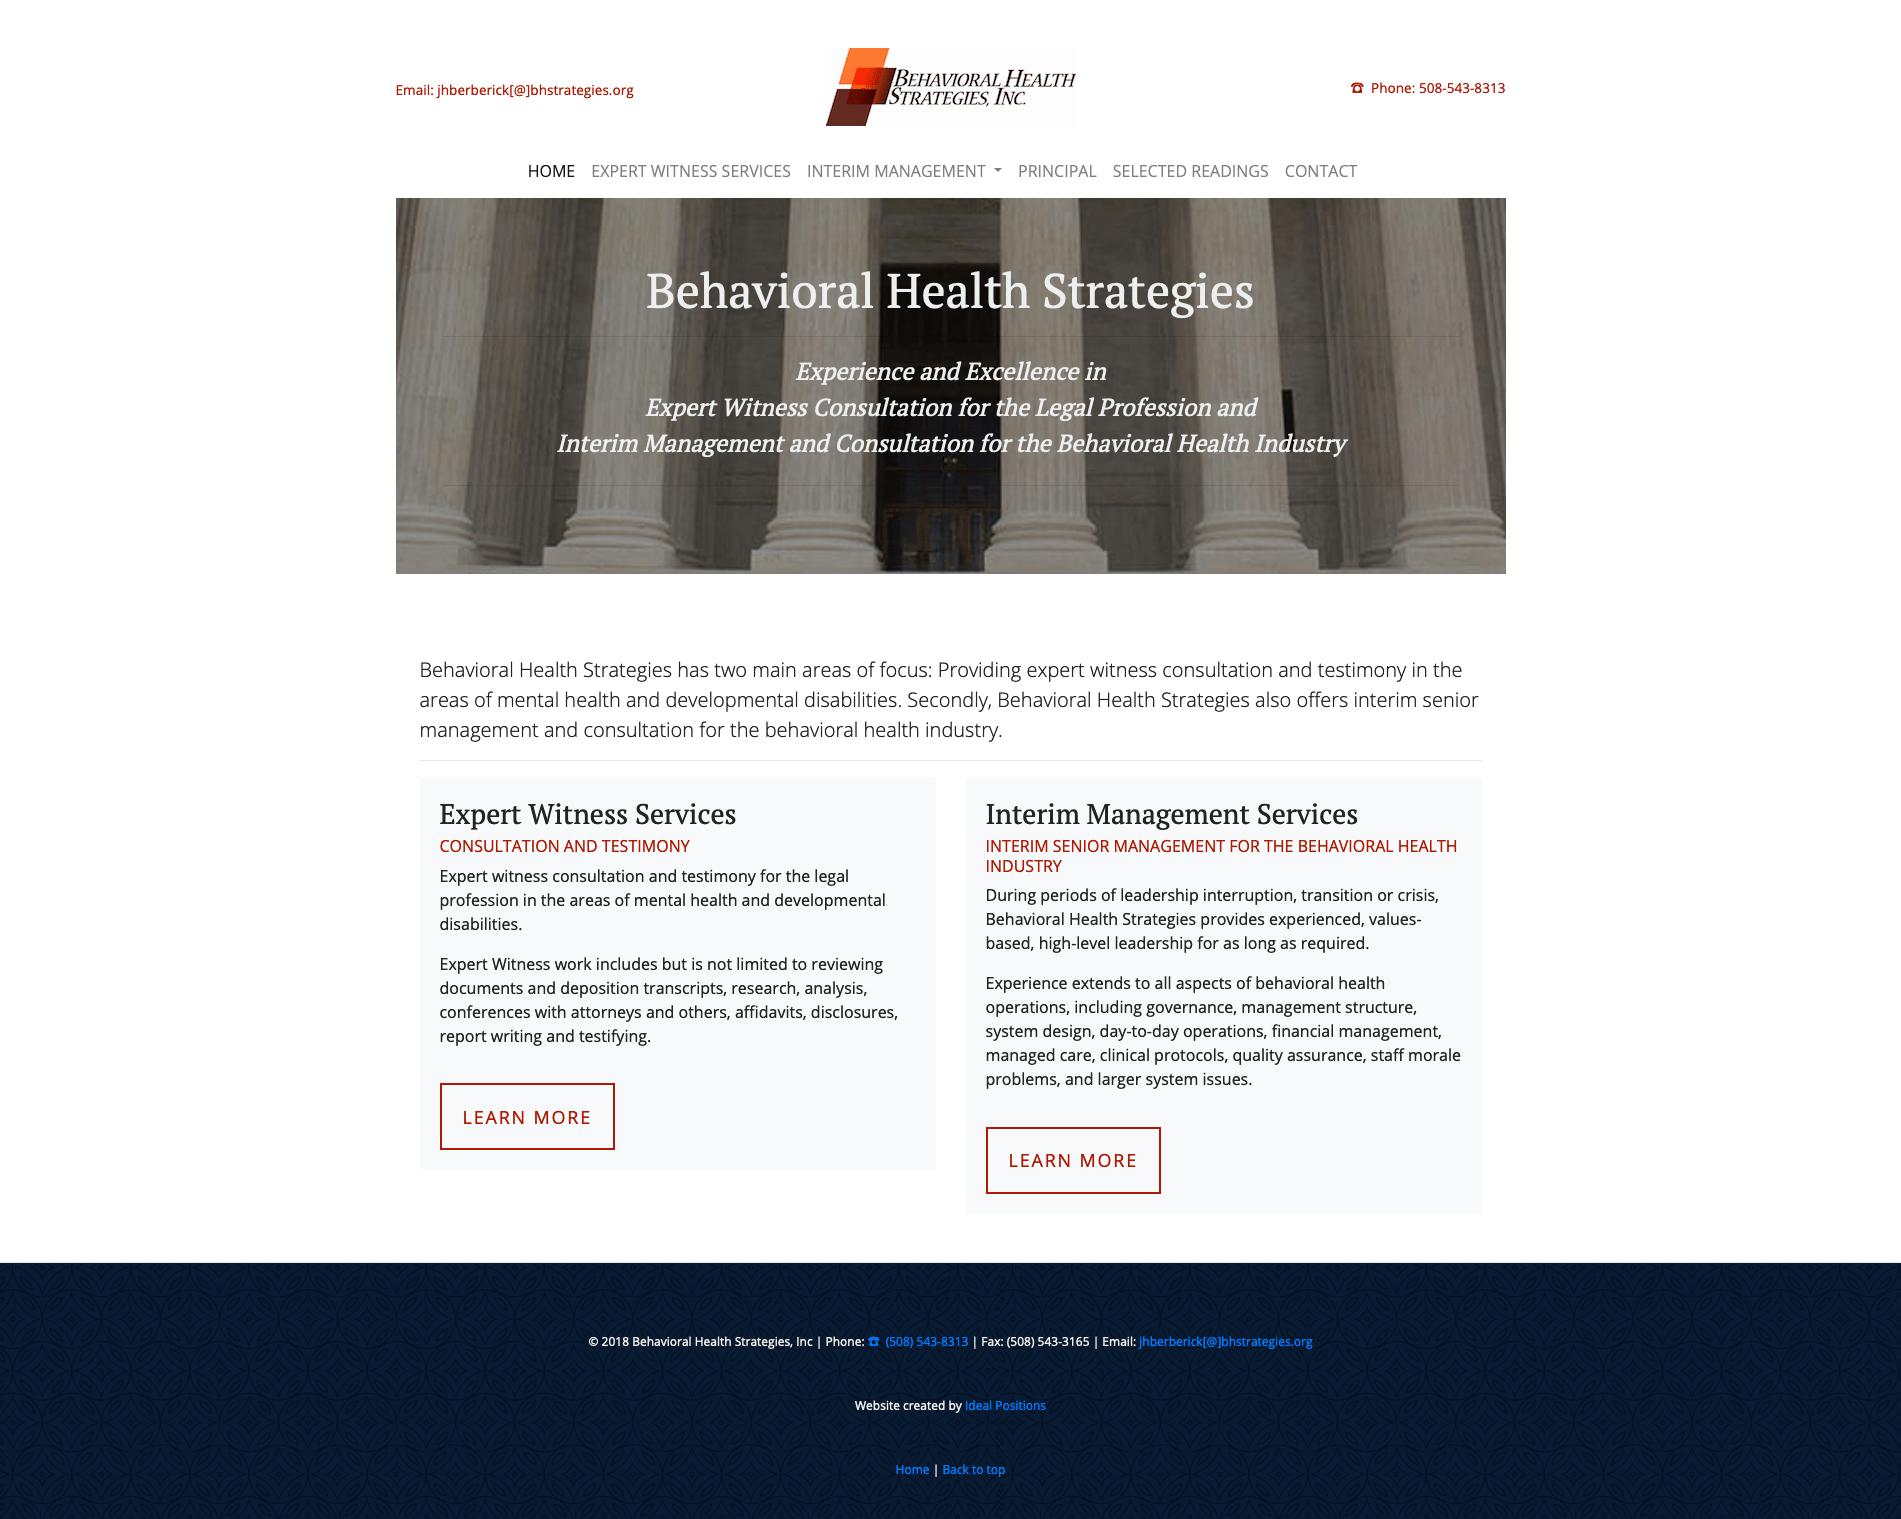 screenshot of expert witness website